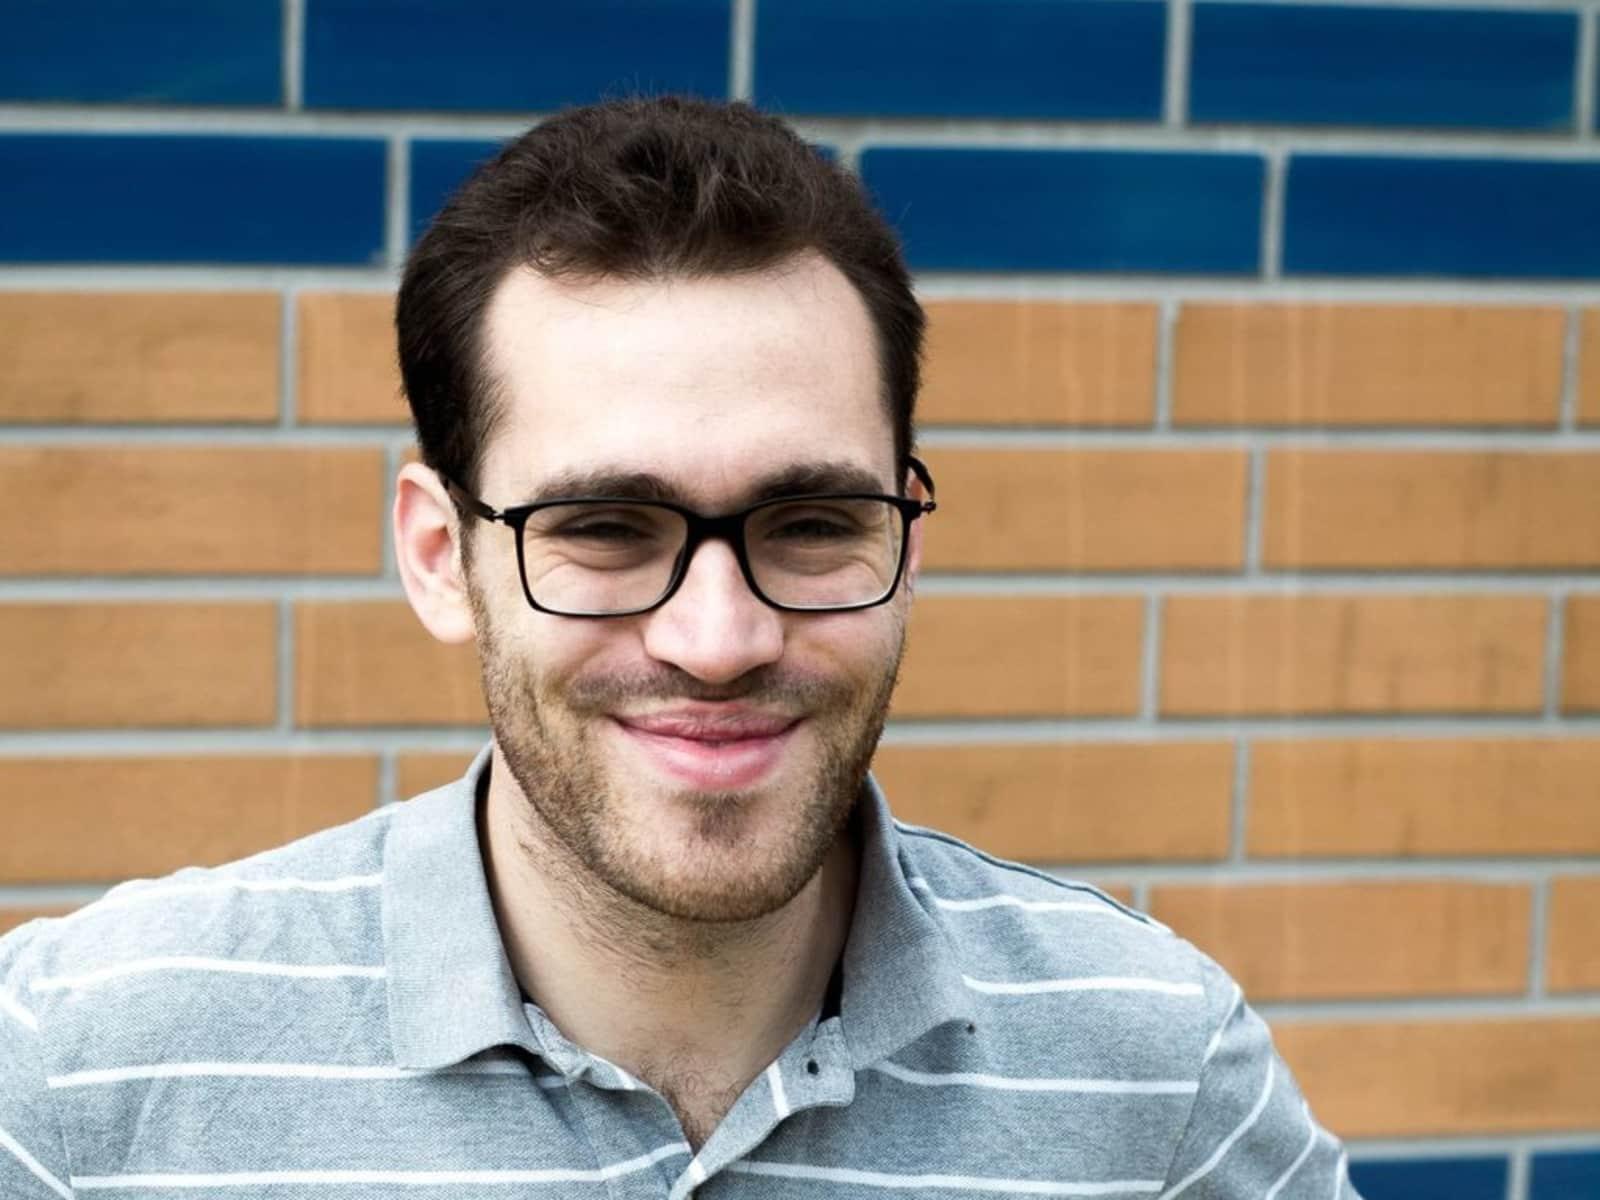 Jacob from Potsdam, Germany